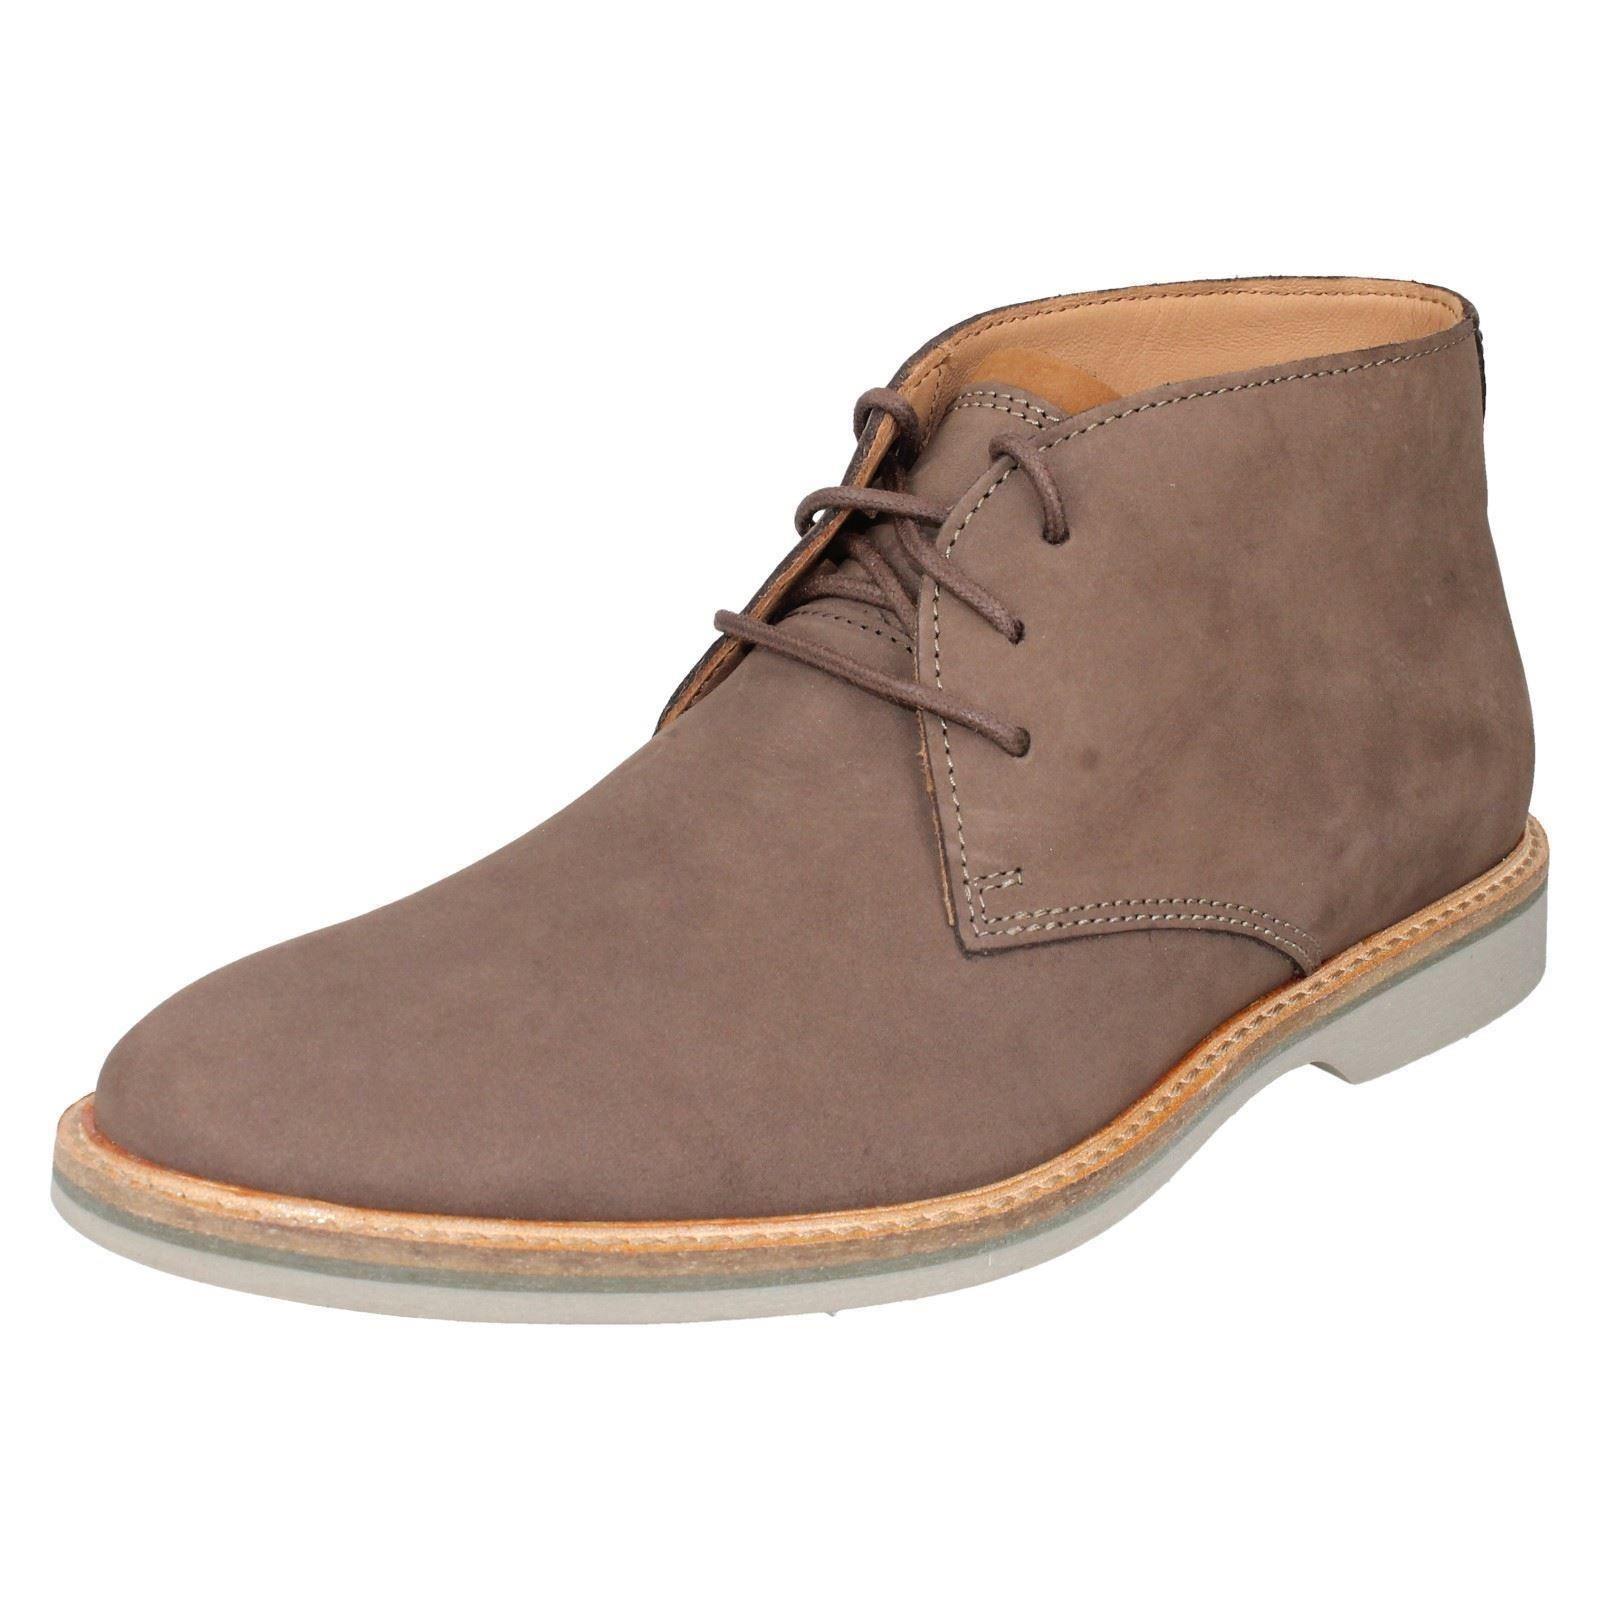 Men's Casual Lace Up Ankle Boots Atticus Limit